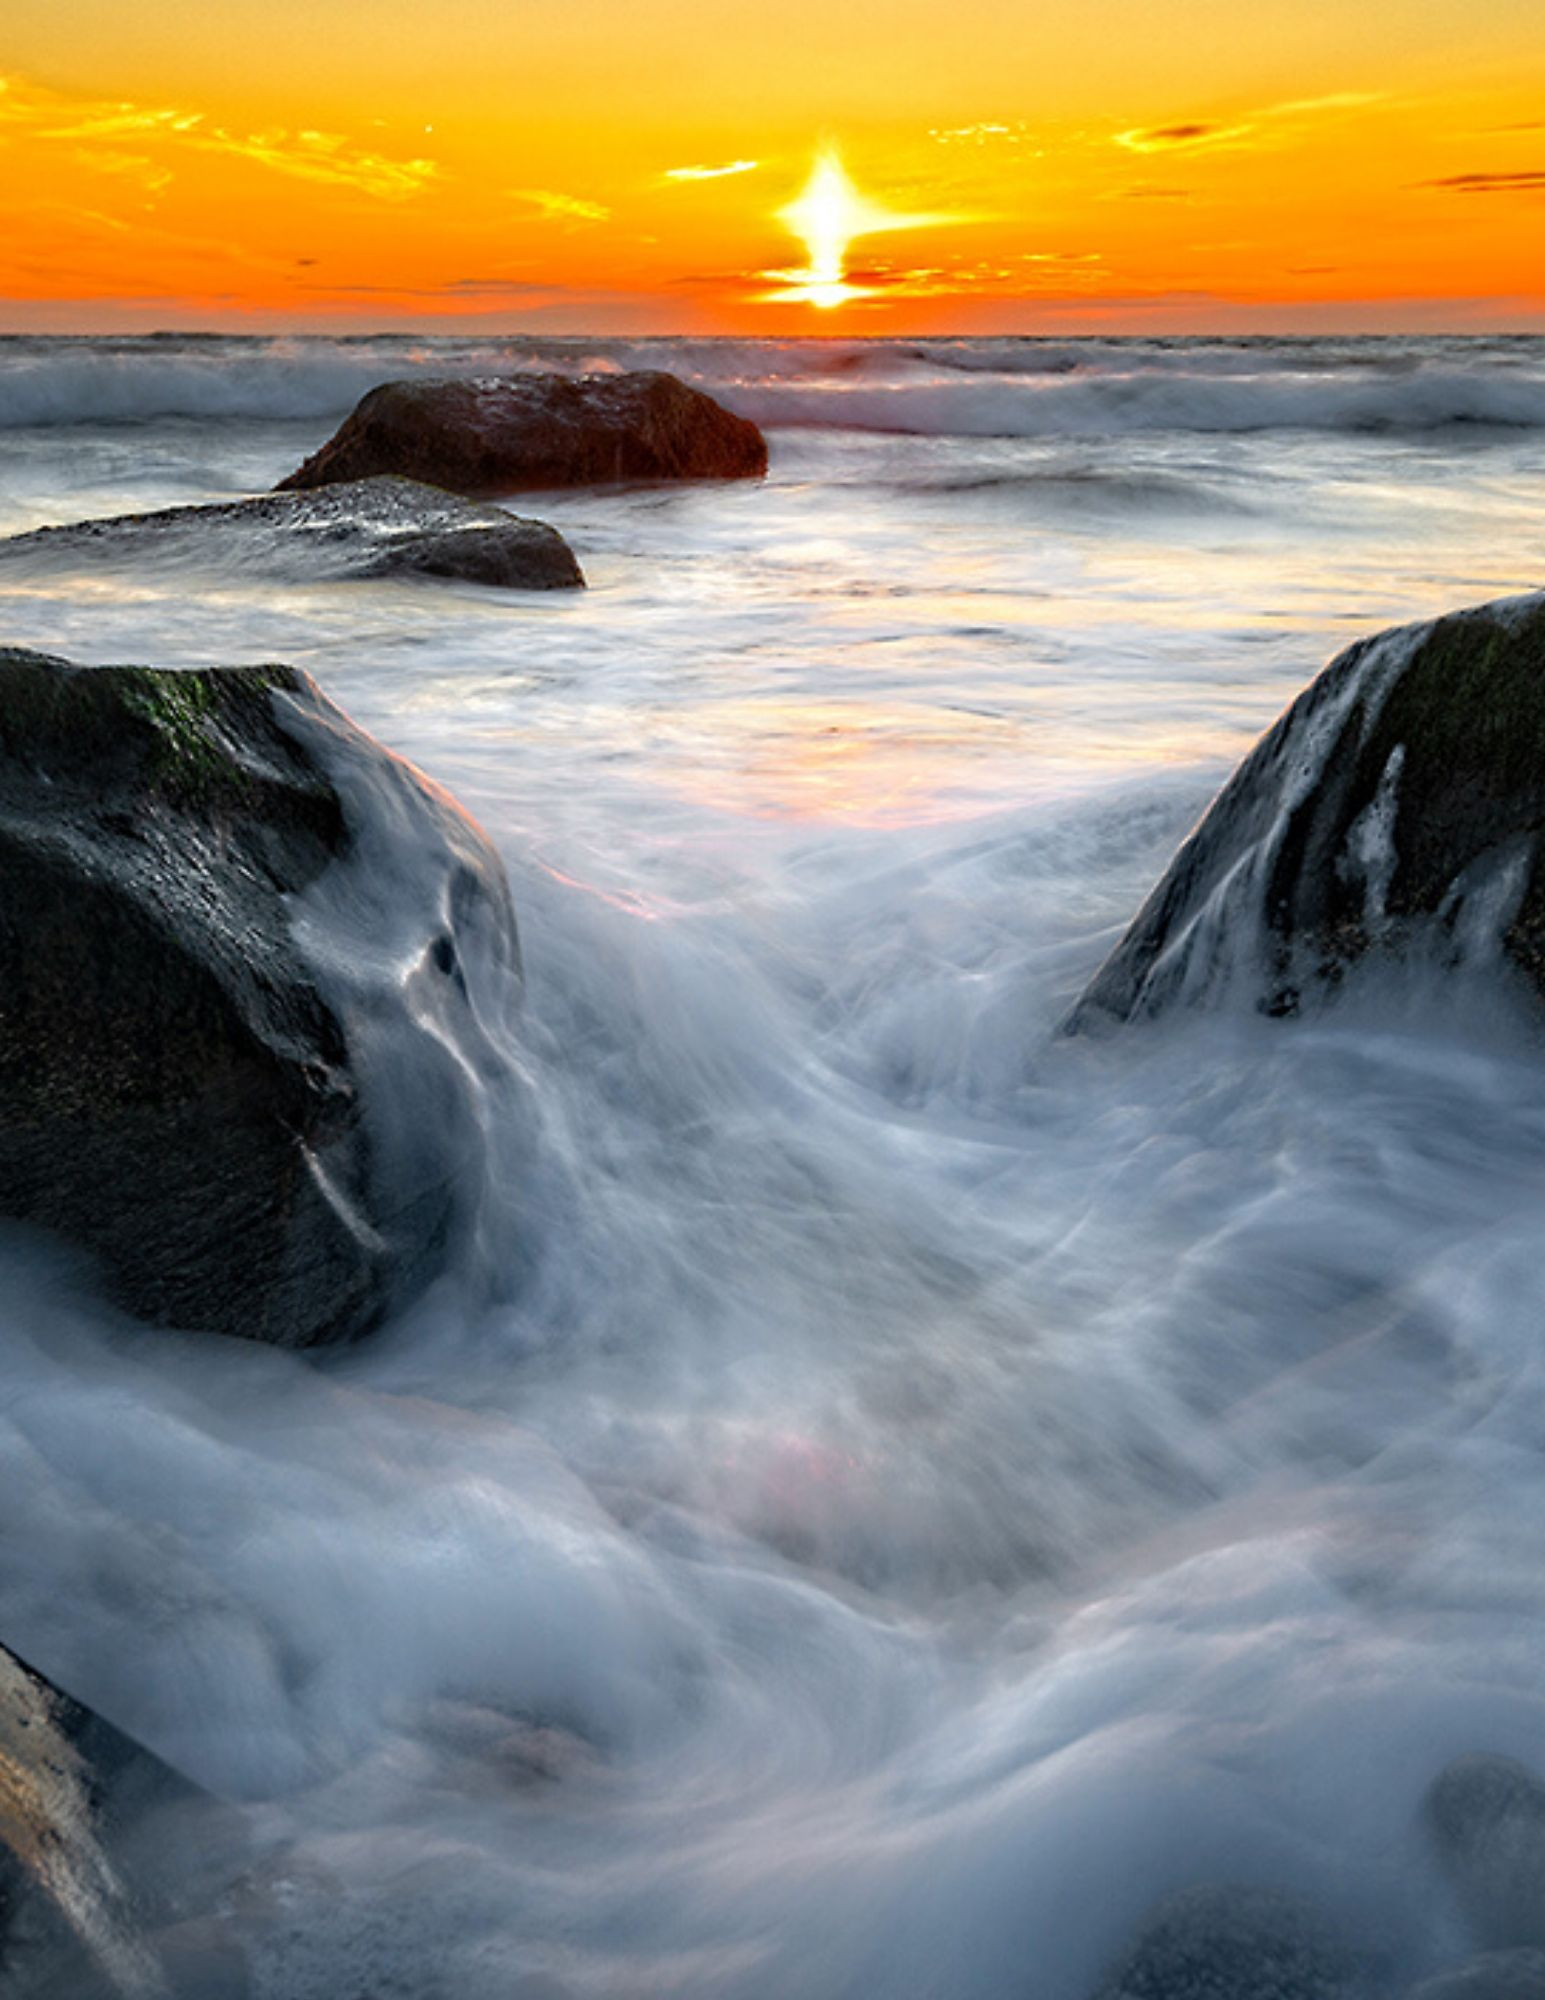 John Montes Jr Photography Best Places to Photograph Sunrise and Sunset on Marthas Vineyard-Best Places to Photograph Sunrise and Sunset on Marthas Vineyard-18